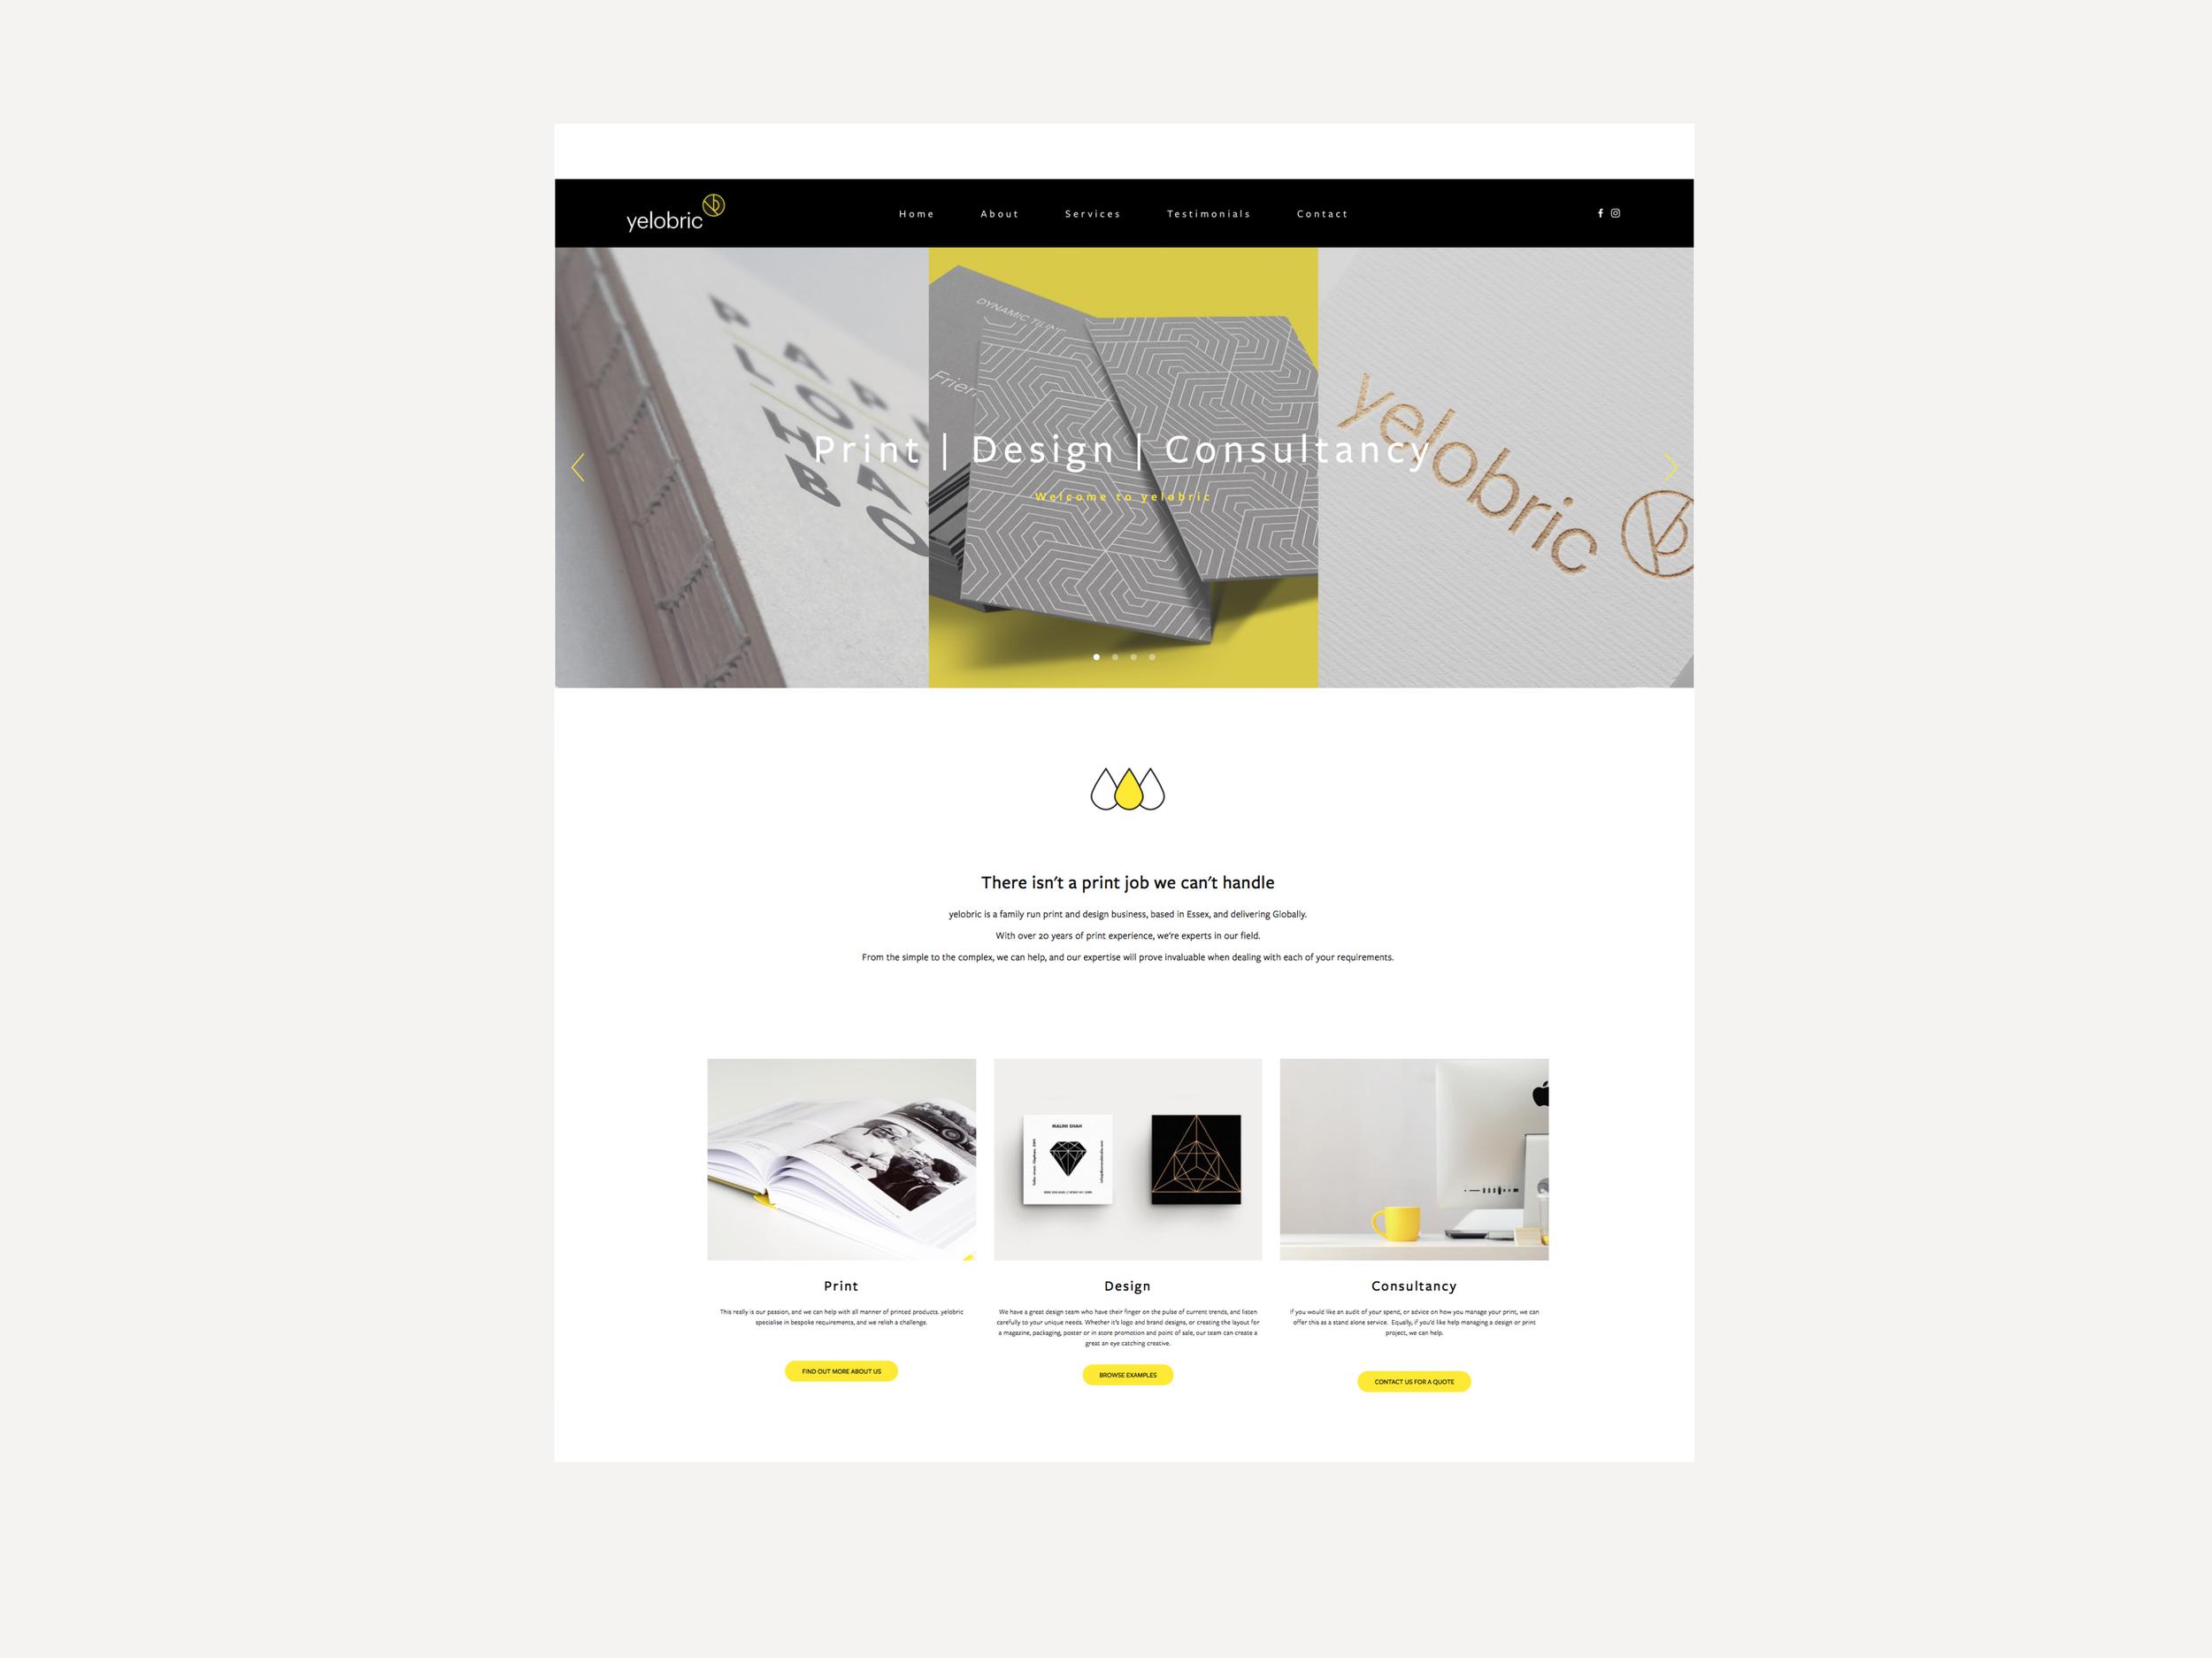 Yelobric-Website-Portfolio-1.png